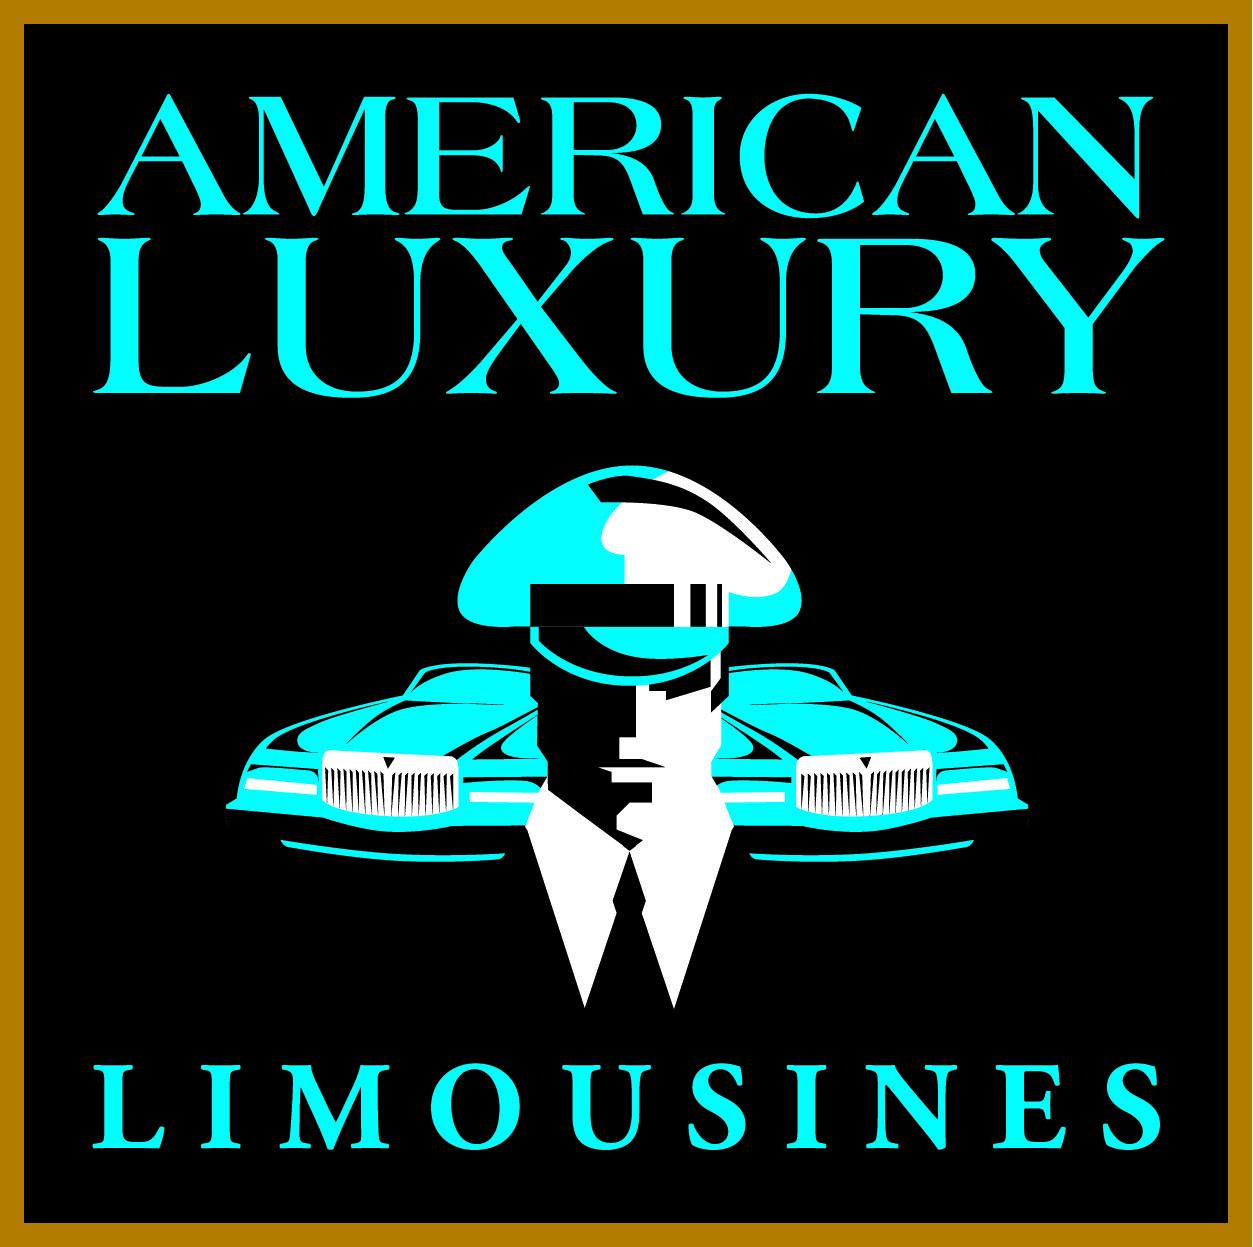 2009 American Luxury logo.jpg